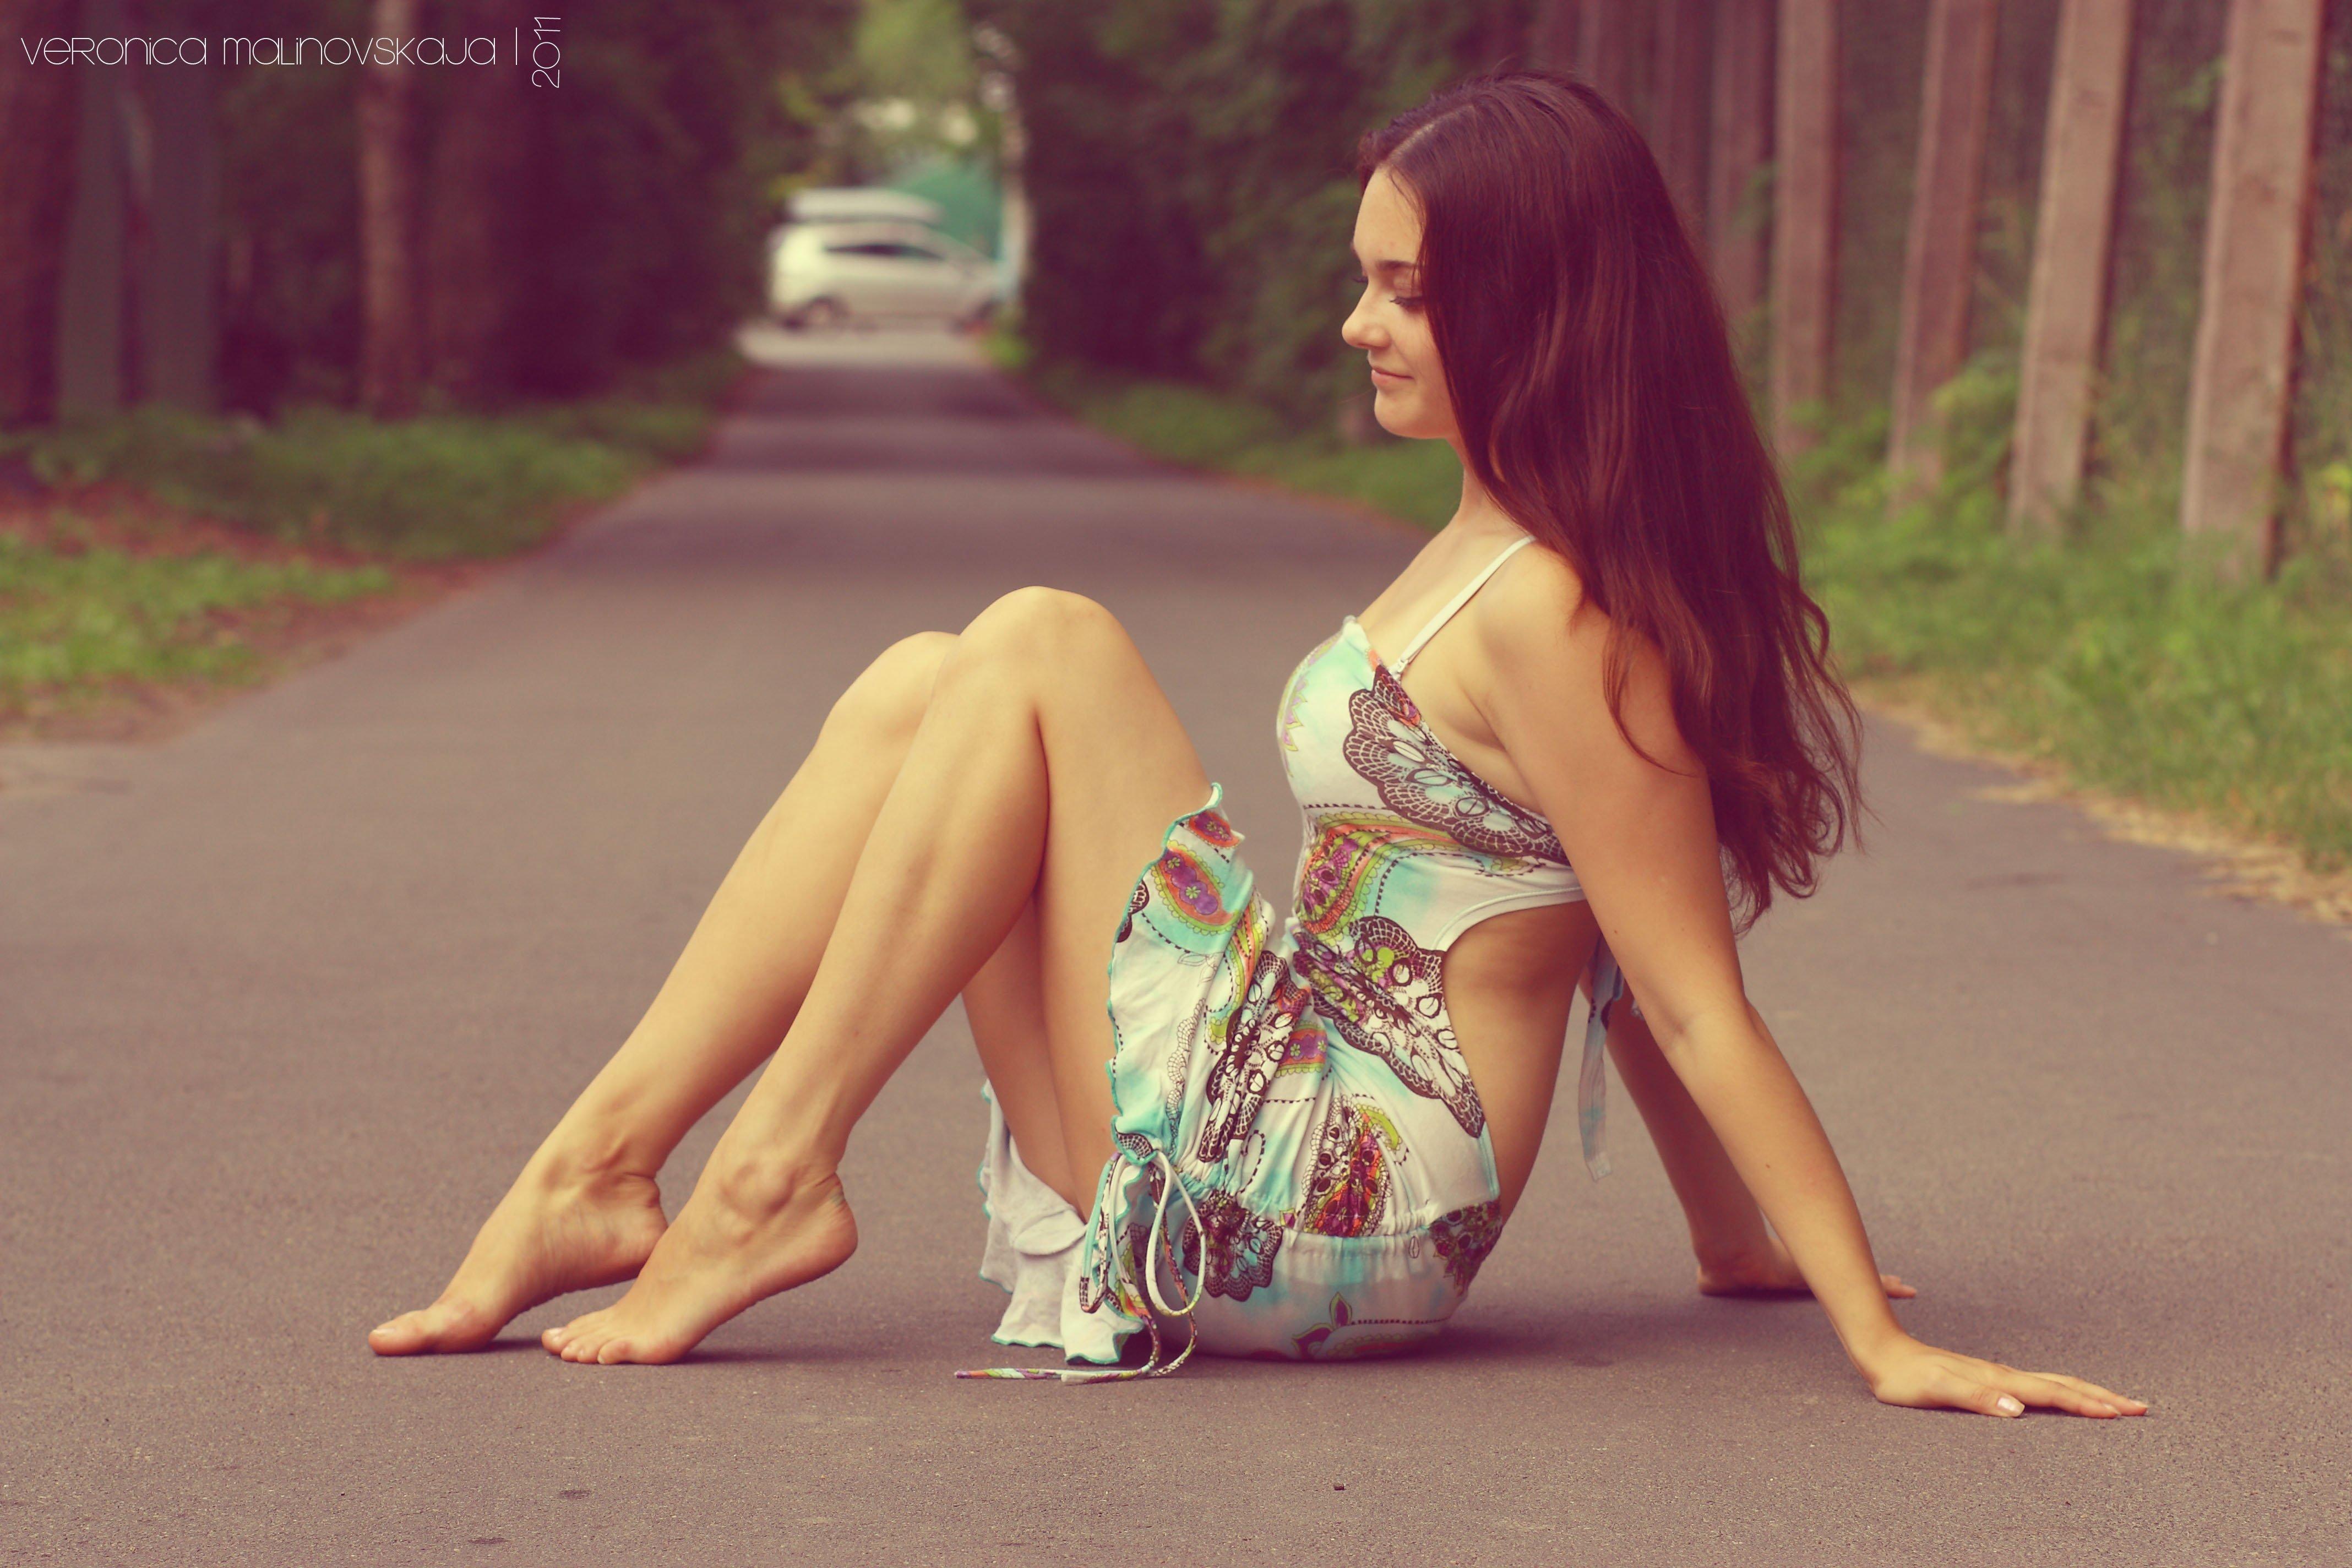 https://img1.goodfon.ru/original/4272x2848/4/18/devushka-bryunetka-plate-6377.jpg